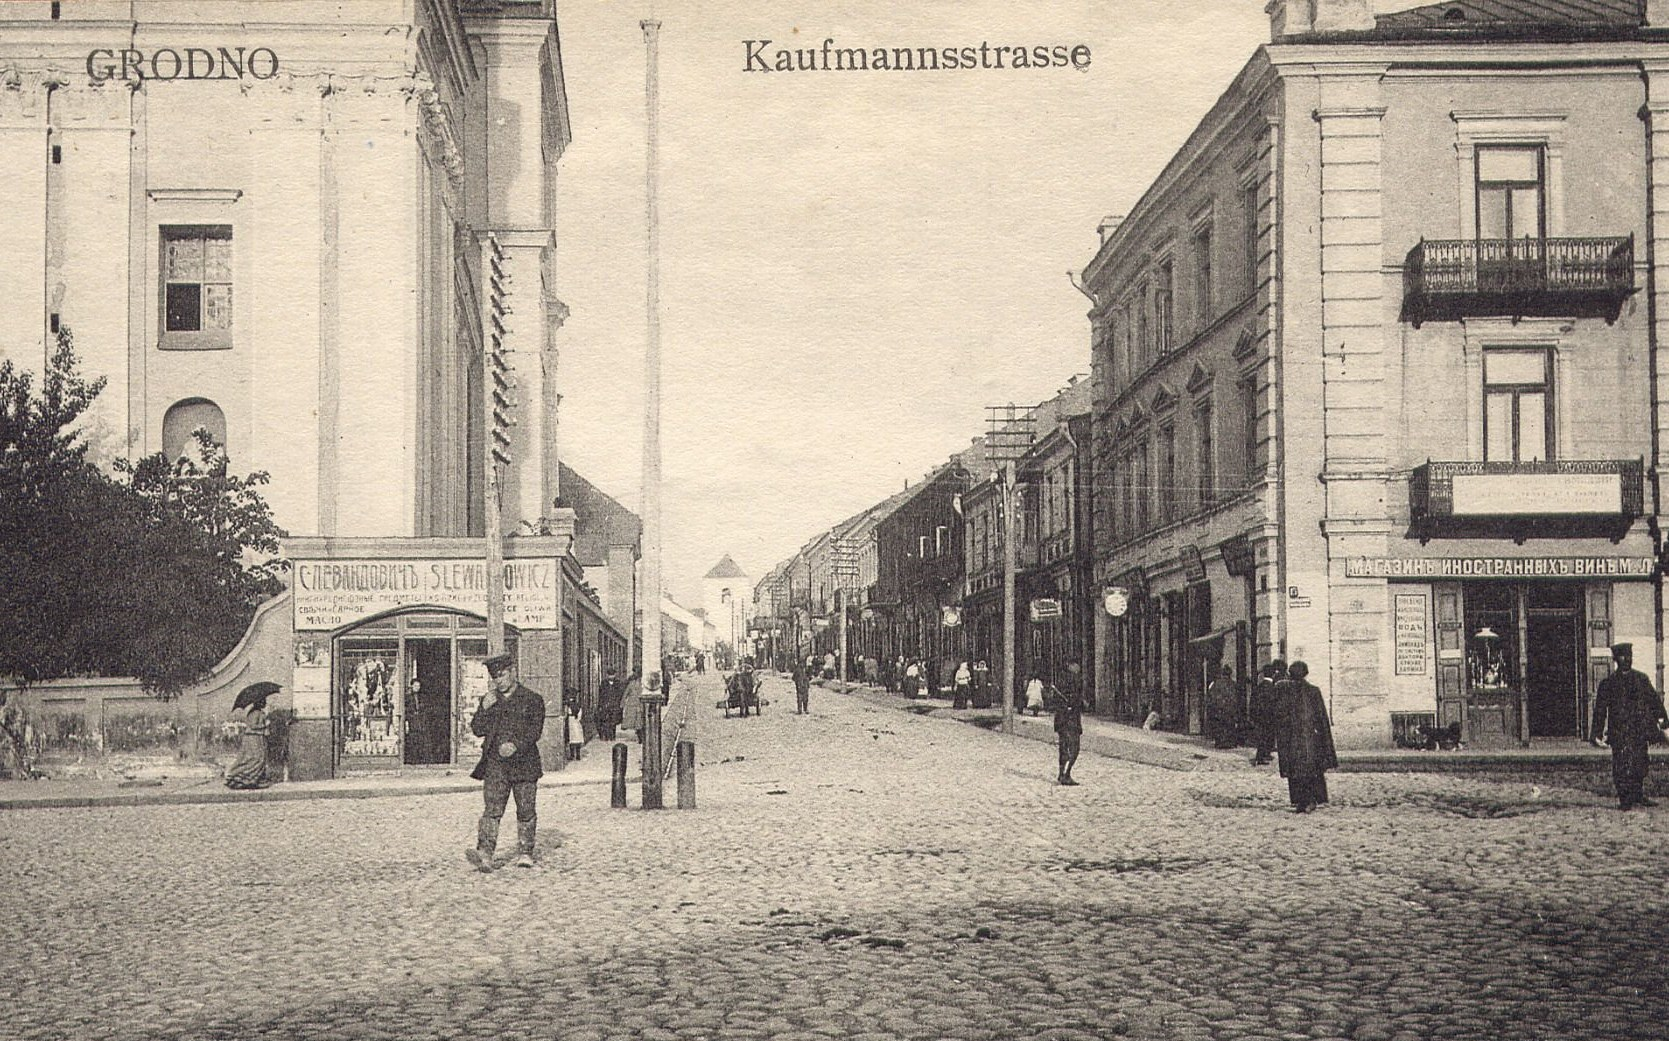 Слева у Фарного костела - магазин Левандовича. Фото из коллекции oldgrodno.by